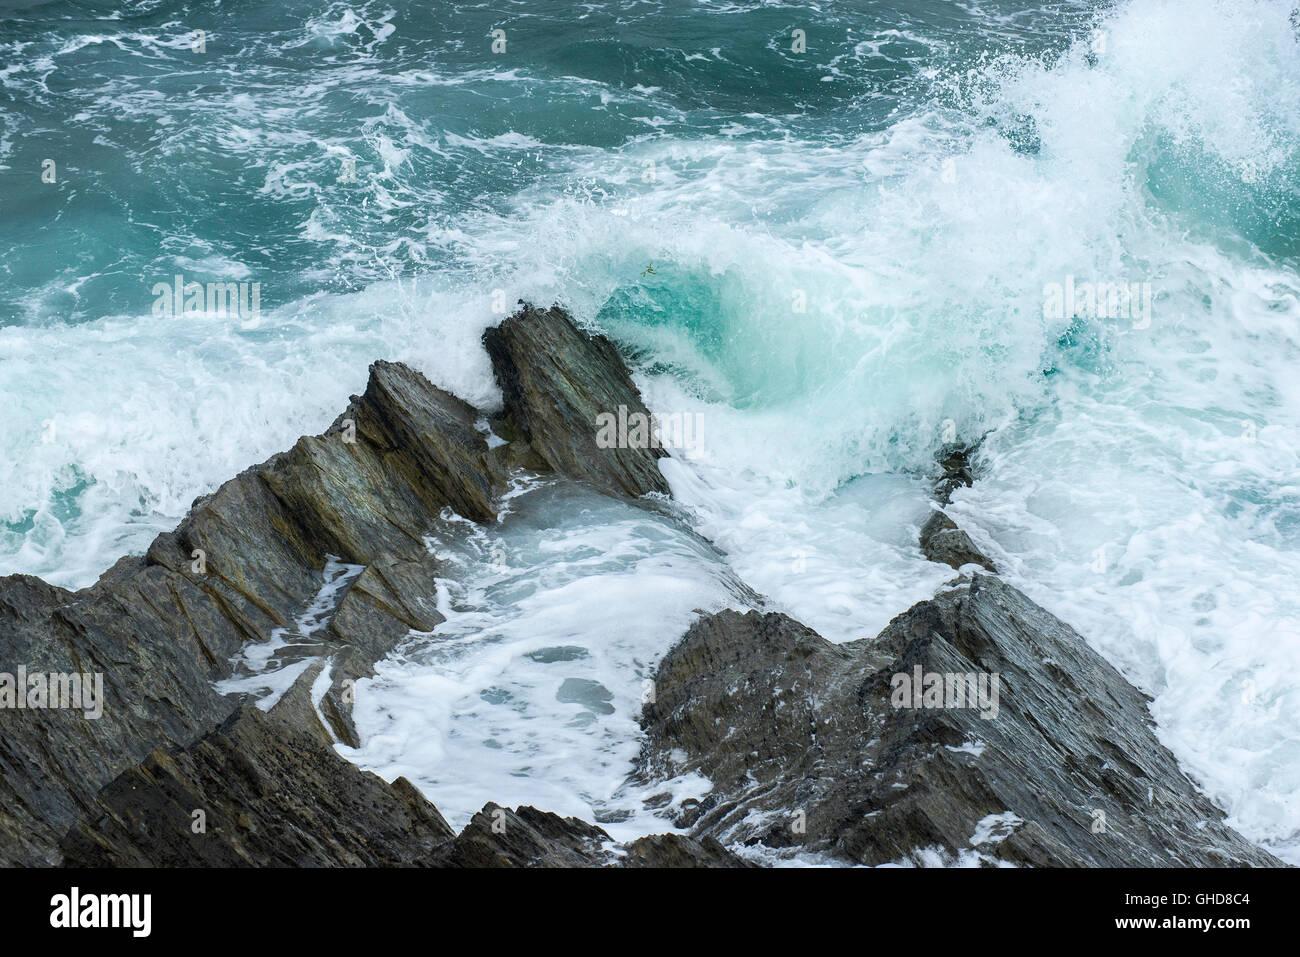 Waves crashing on rocks at Towan Headland in Newquay, Cornwall. Stock Photo